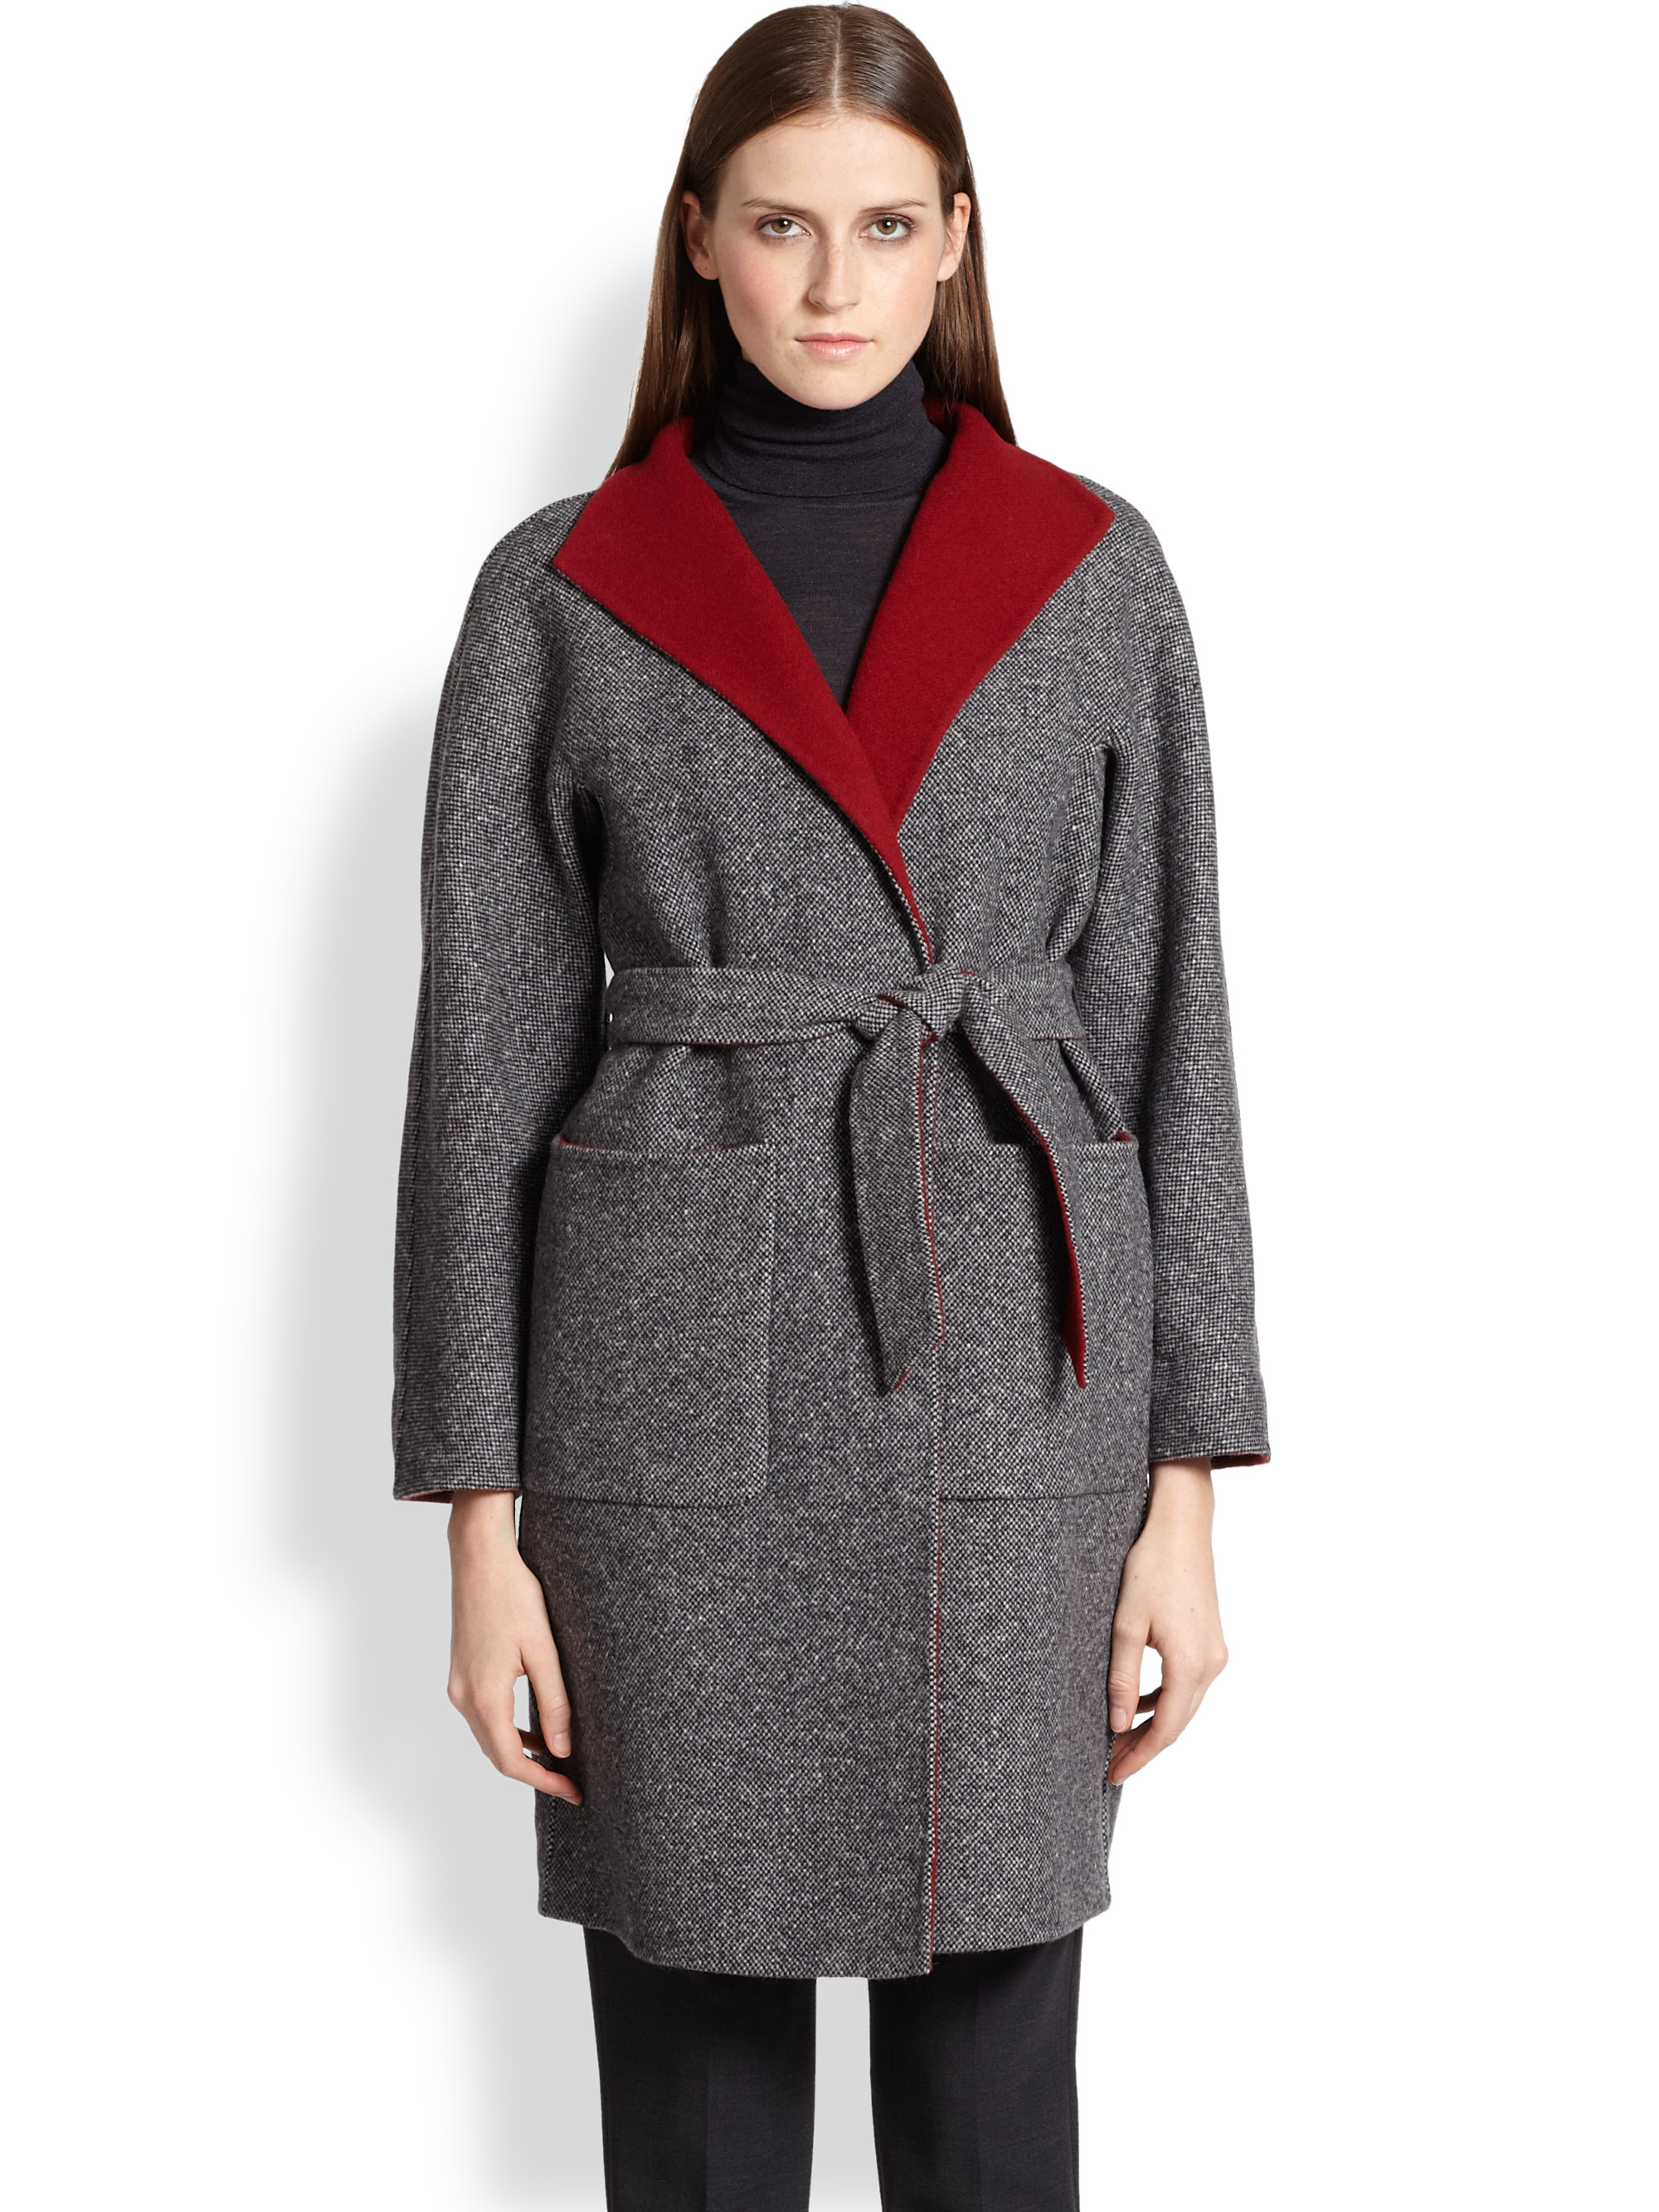 Max mara Oronte Tweed Wrap Coat in Gray | Lyst